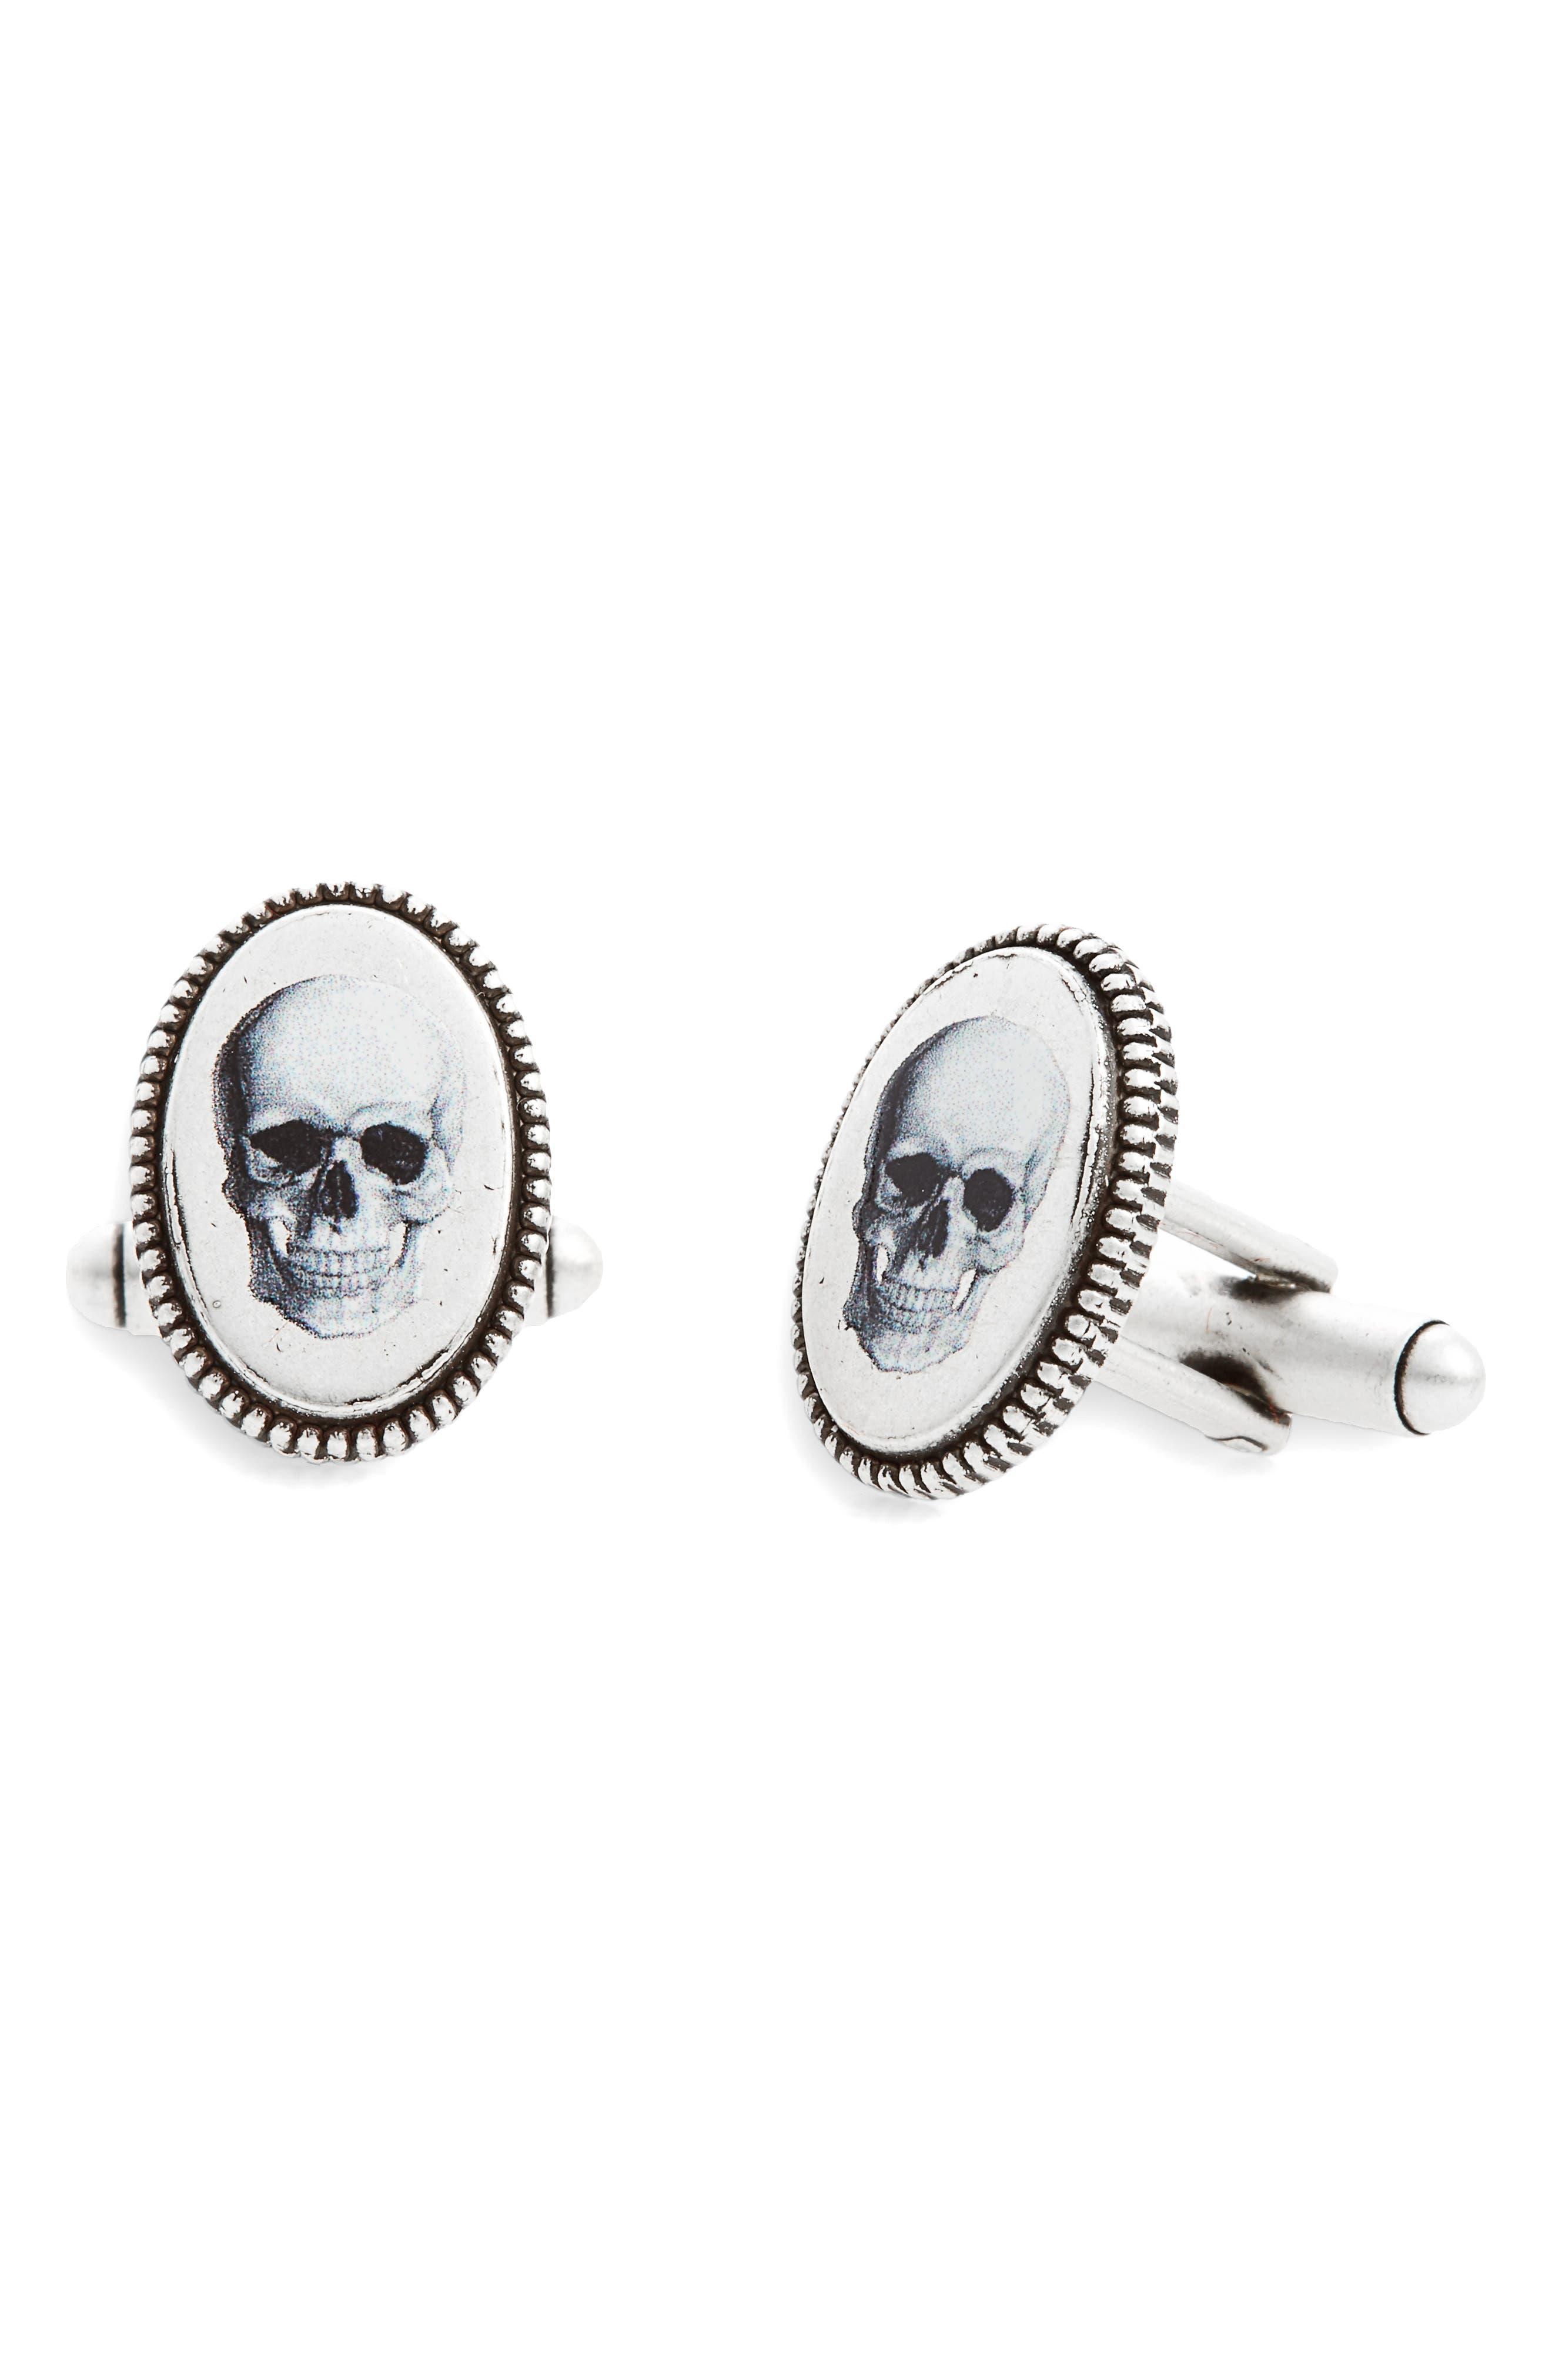 Main Image - Link Up Skull Cuff Links